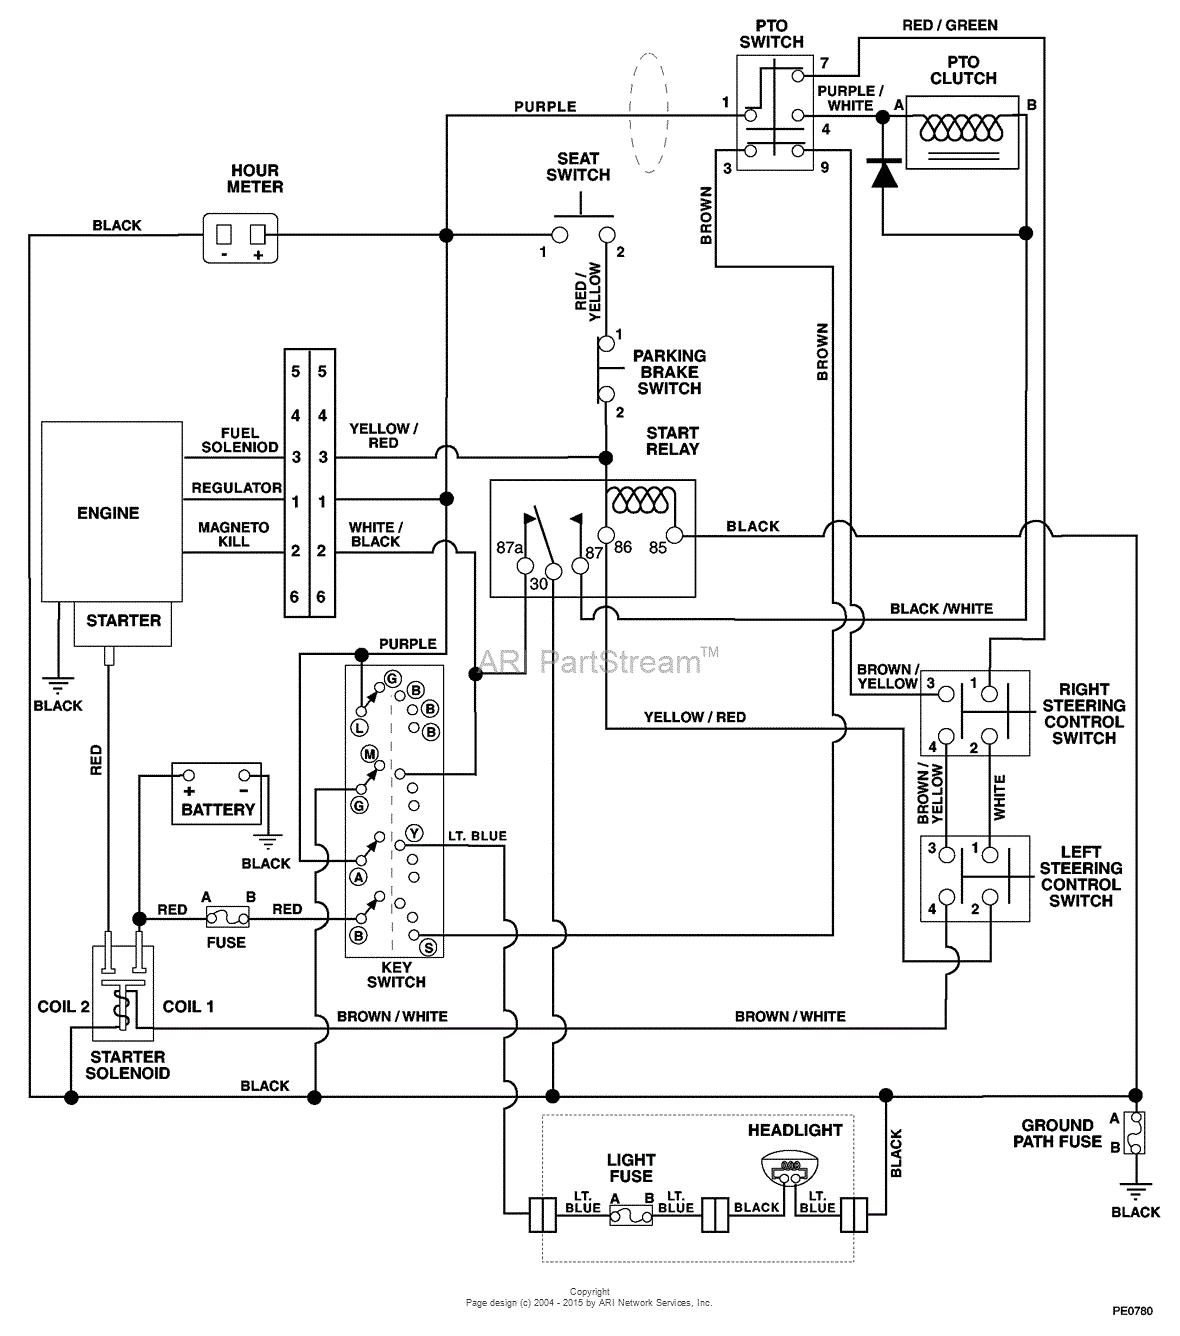 c33 laurel wiring diagram 1 wiring diagram source 300zx wiring diagram nissan laurel c33 wiring diagram